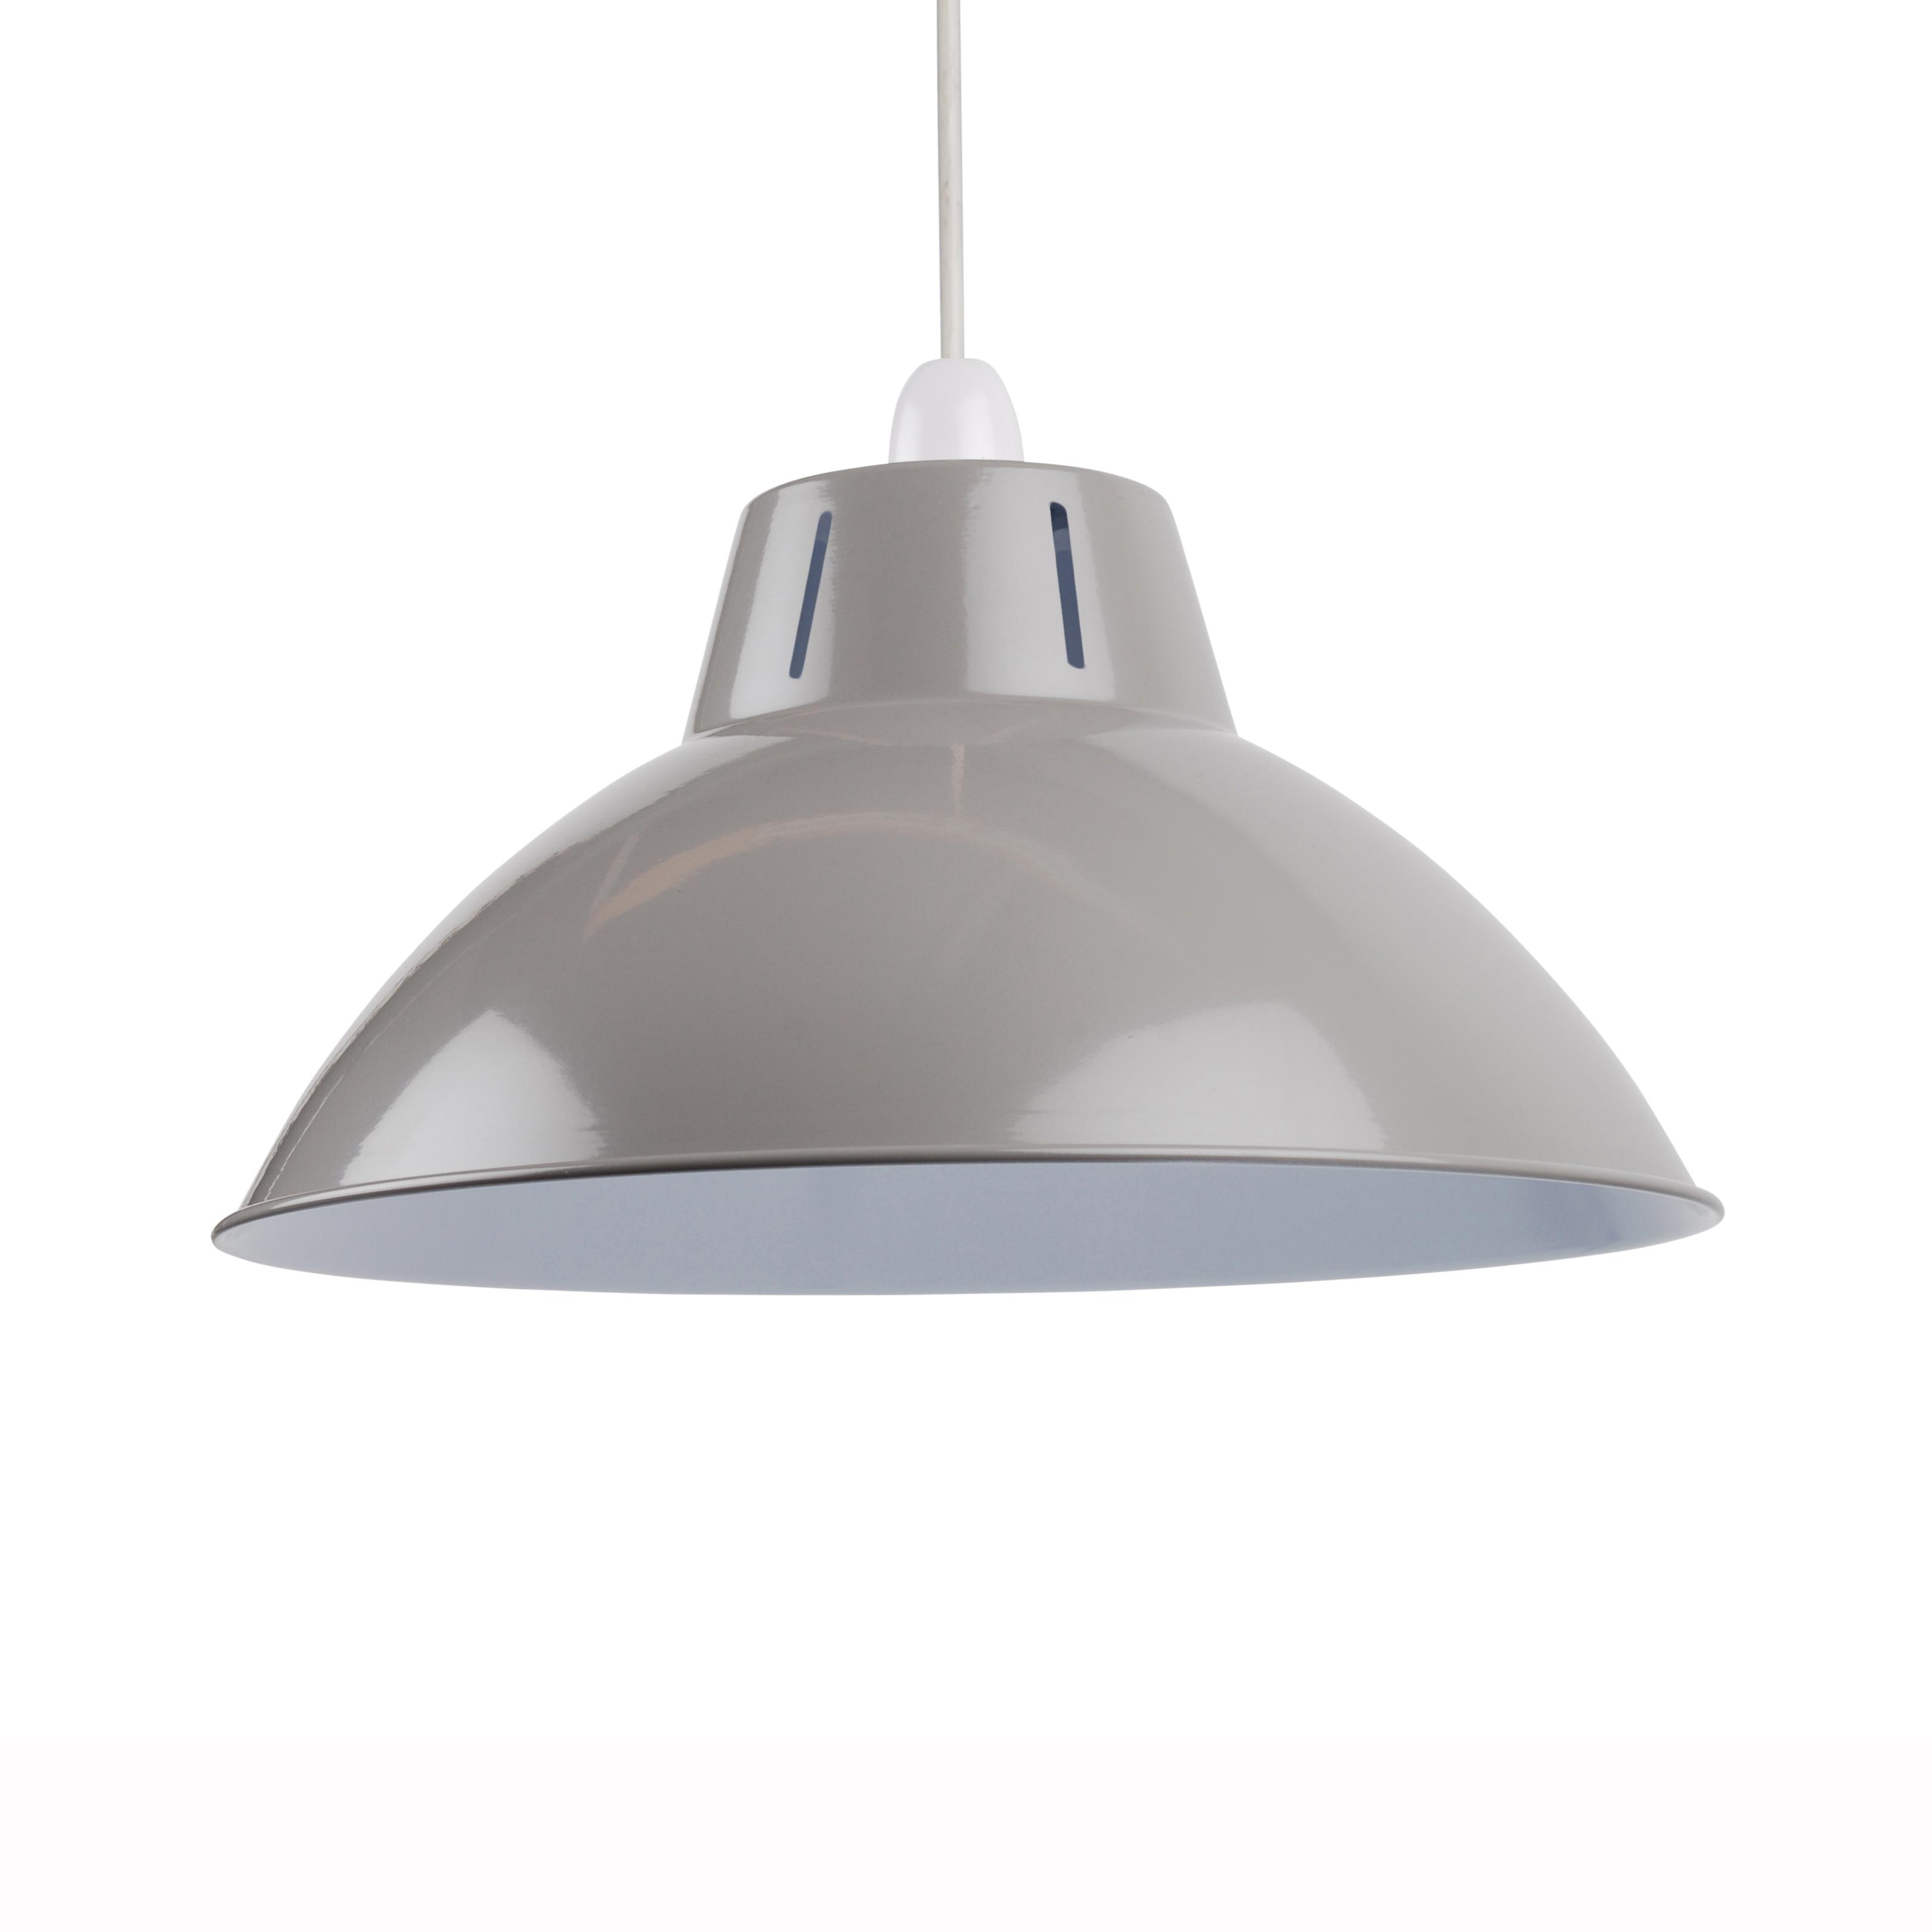 Grey 350mm 14 Industrial Metal Coolie Ceiling Light Shade